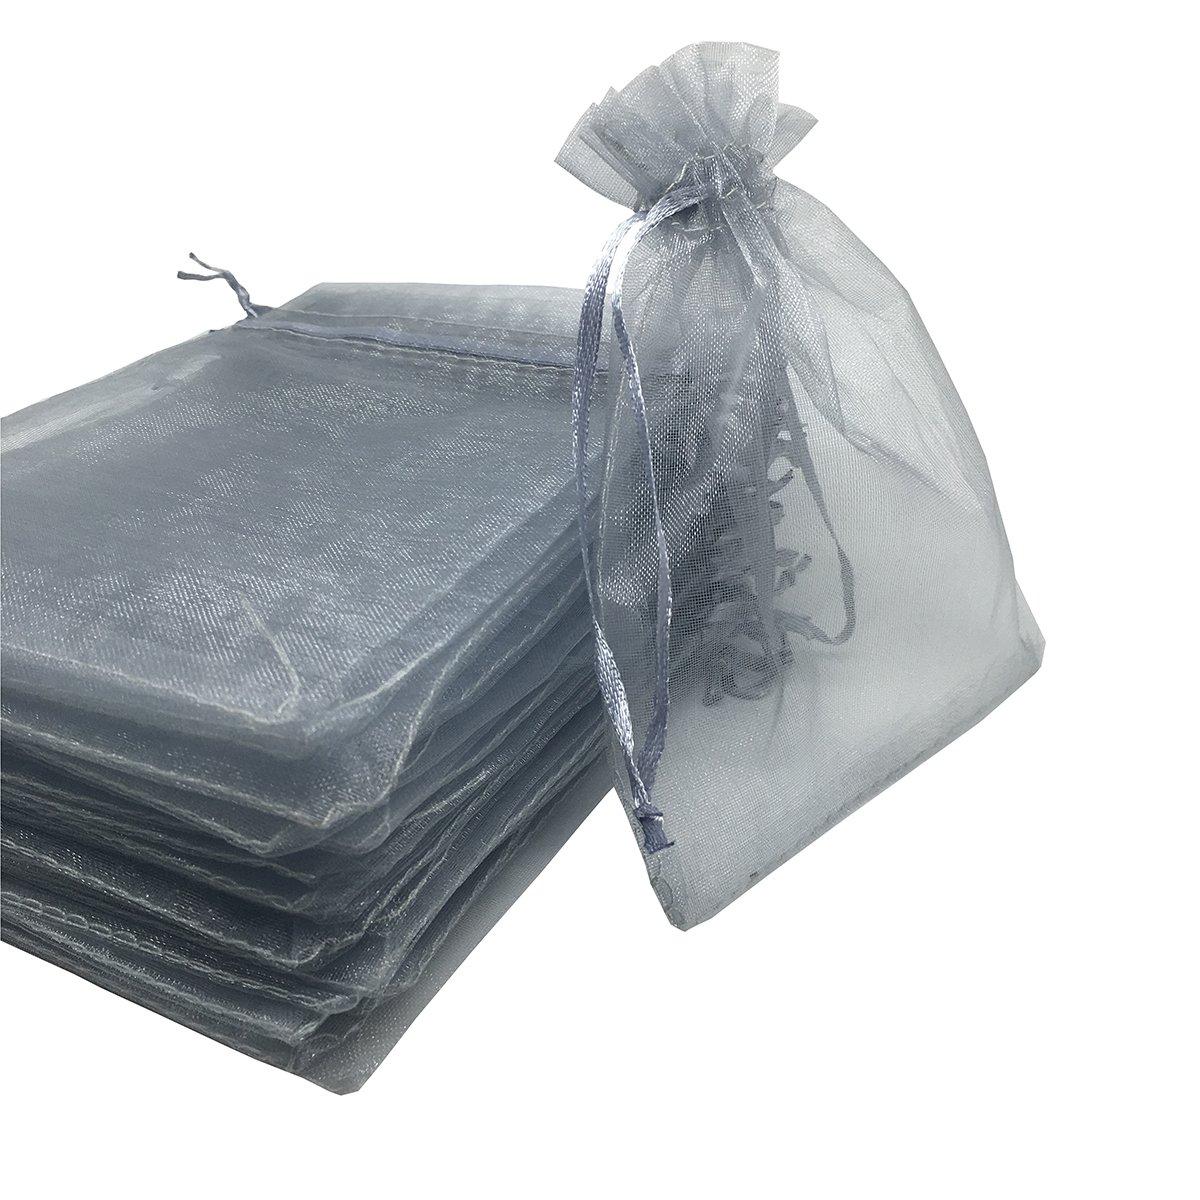 YIJUE 100pcs 4x6 Inches Drawstrings Organza Gift Candy Bags Wedding Favors Bags (Gray) by YIJUE